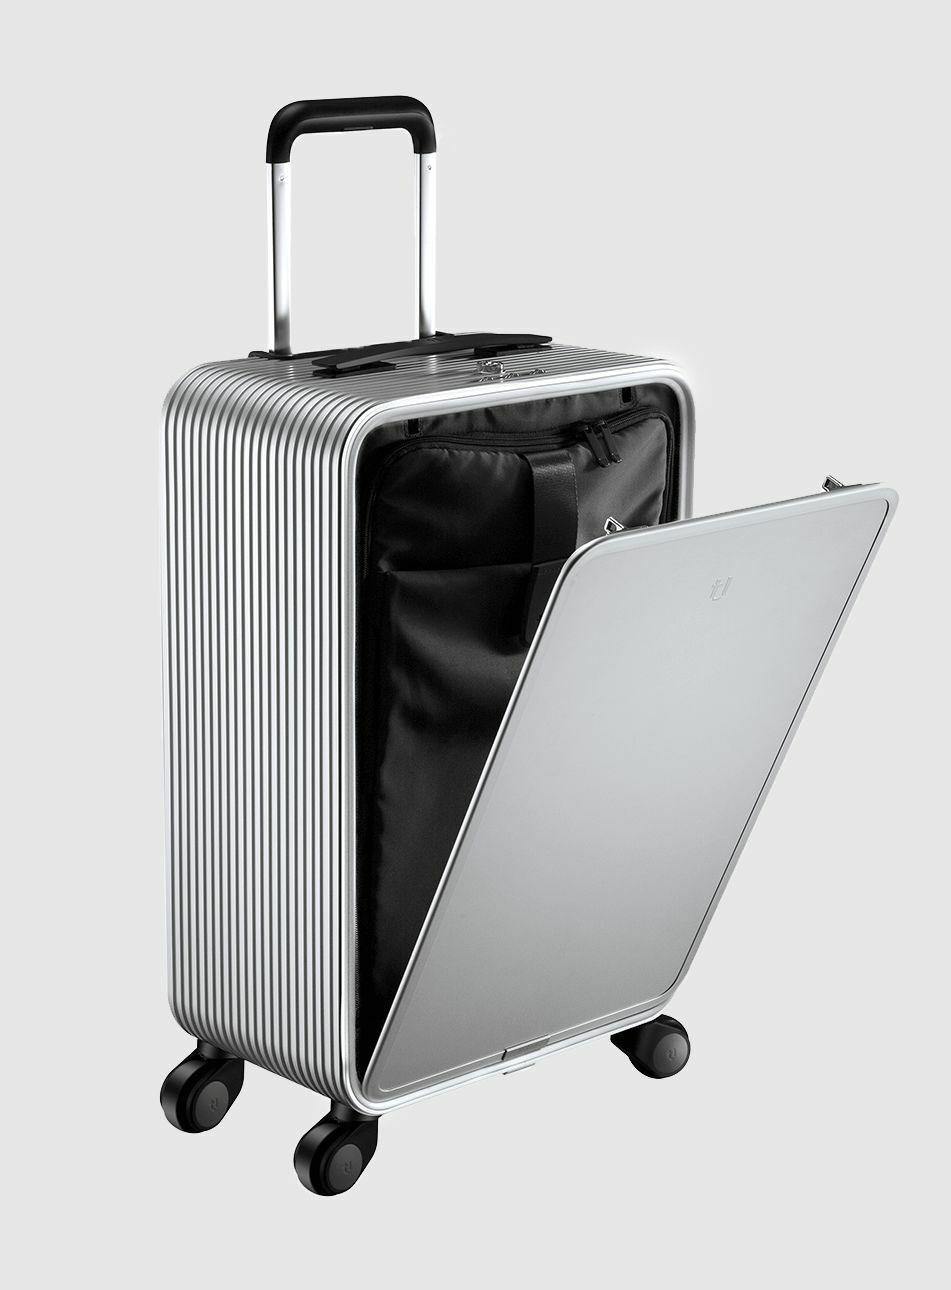 Tuplus X2 Carry-On